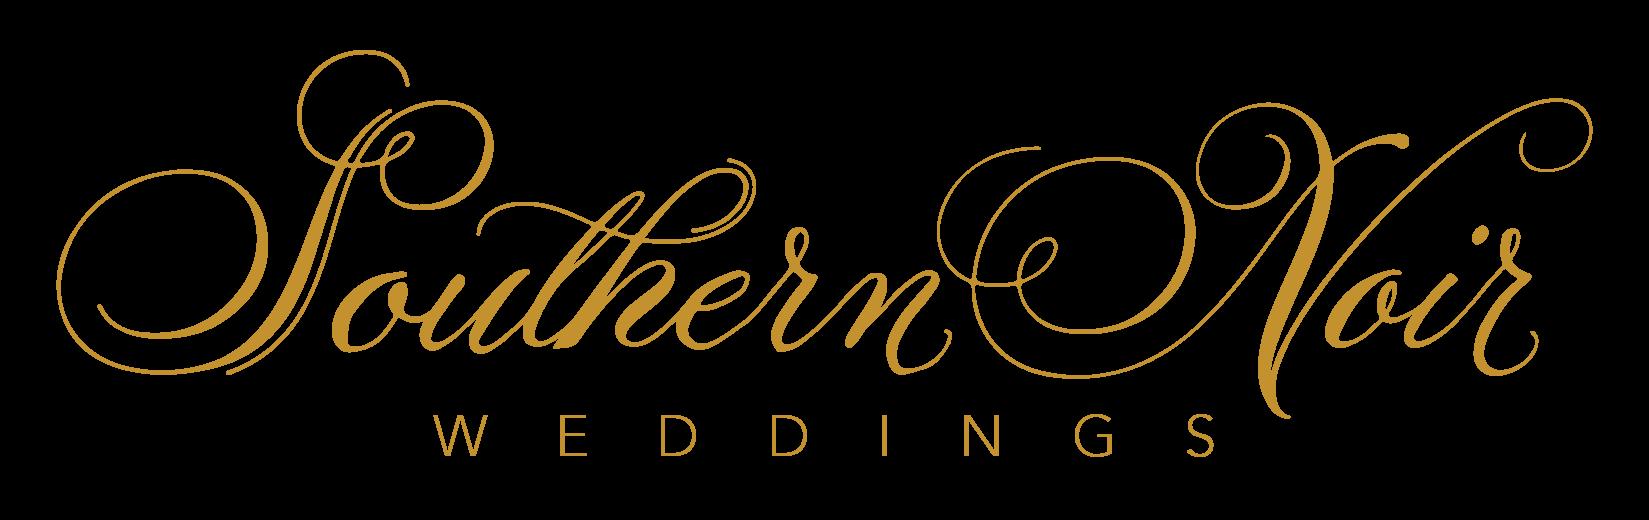 southern_noir_weddings_logo.png